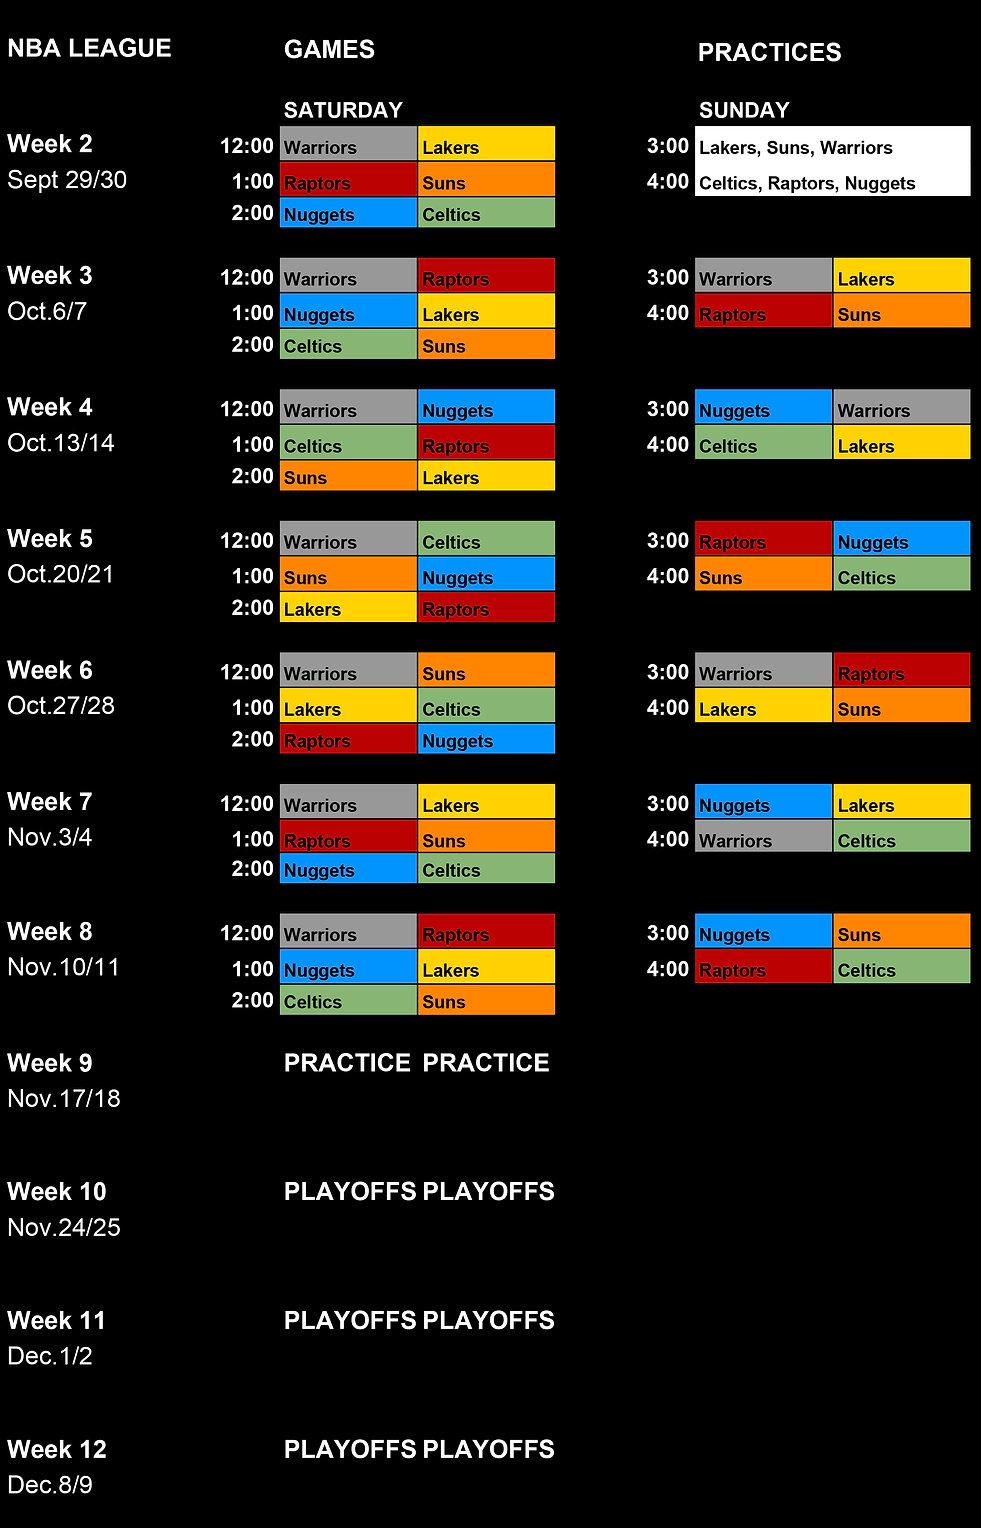 NBA ScheduleJPG.jpg